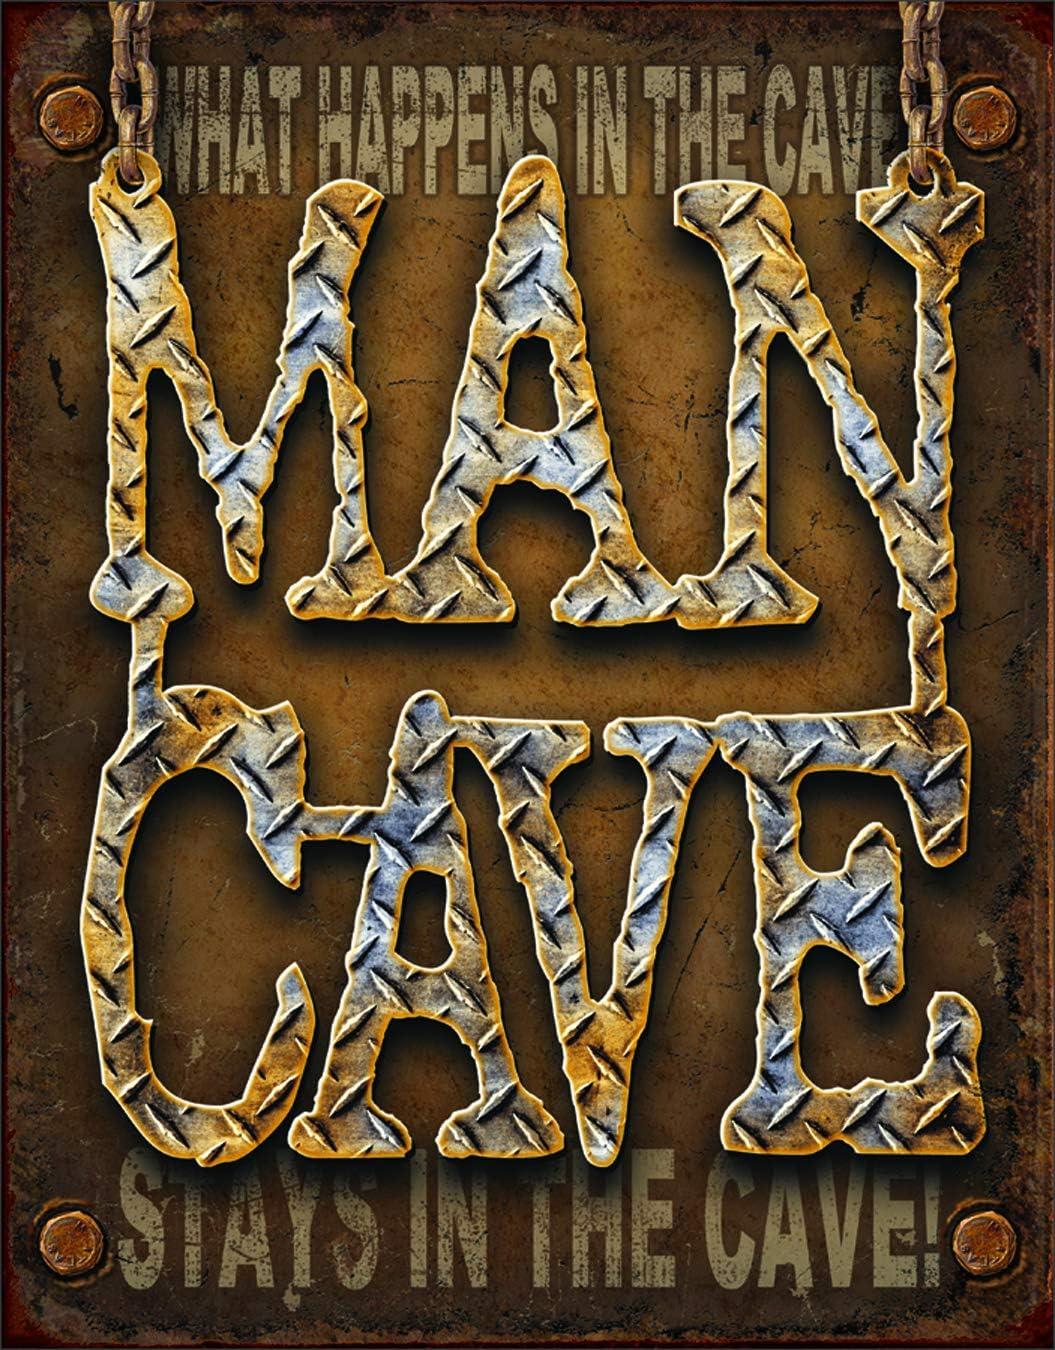 Desperate Enterprises Man Cave - Deluxe Diamond Tin 16